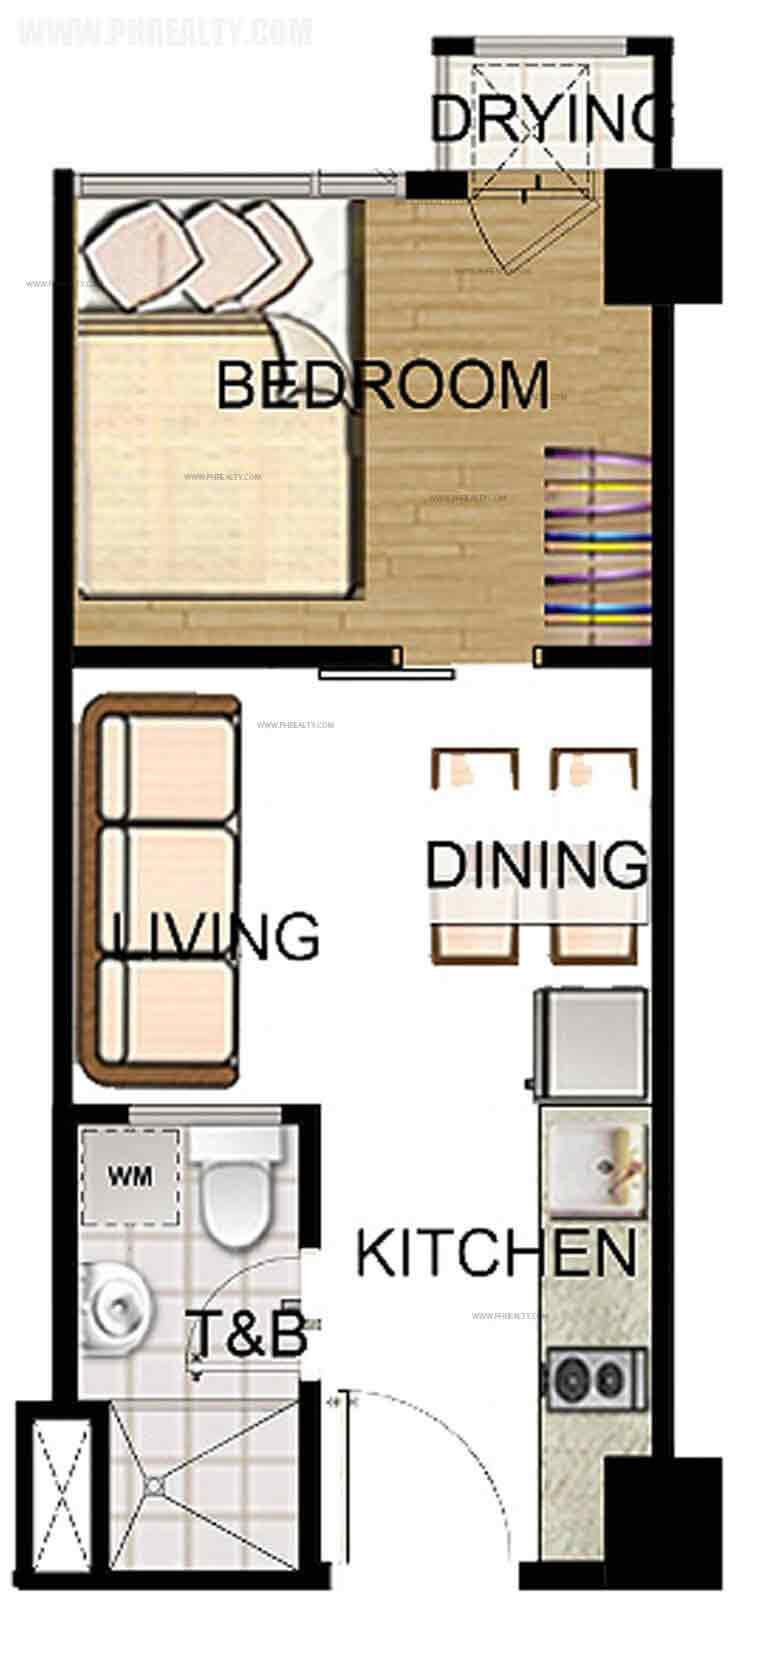 1 Bedroom Standard Unit